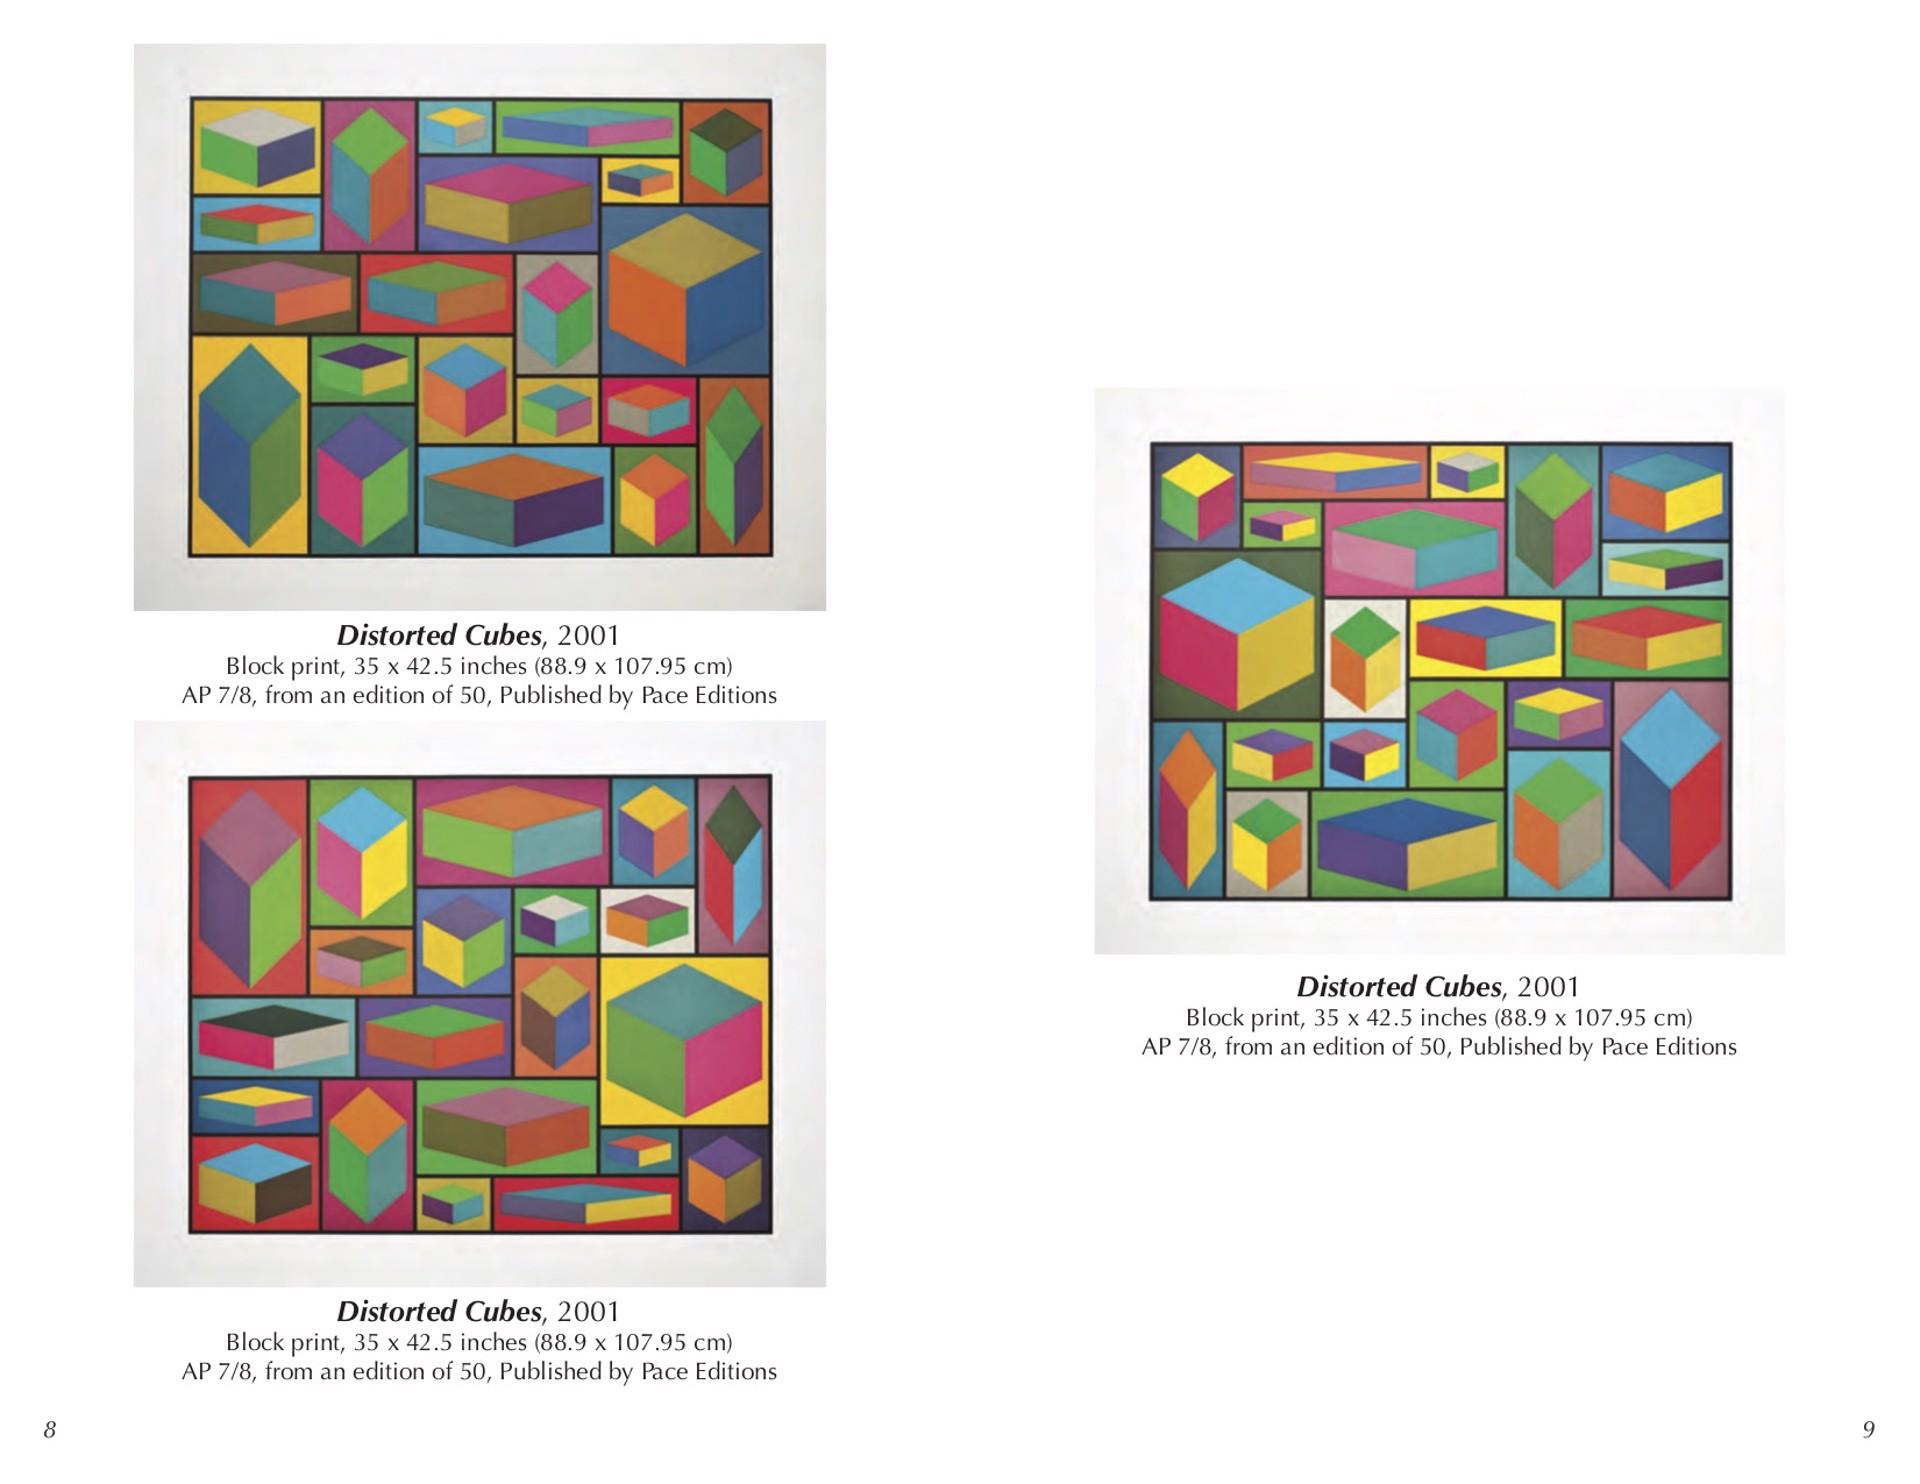 The Prints of Sol Lewitt